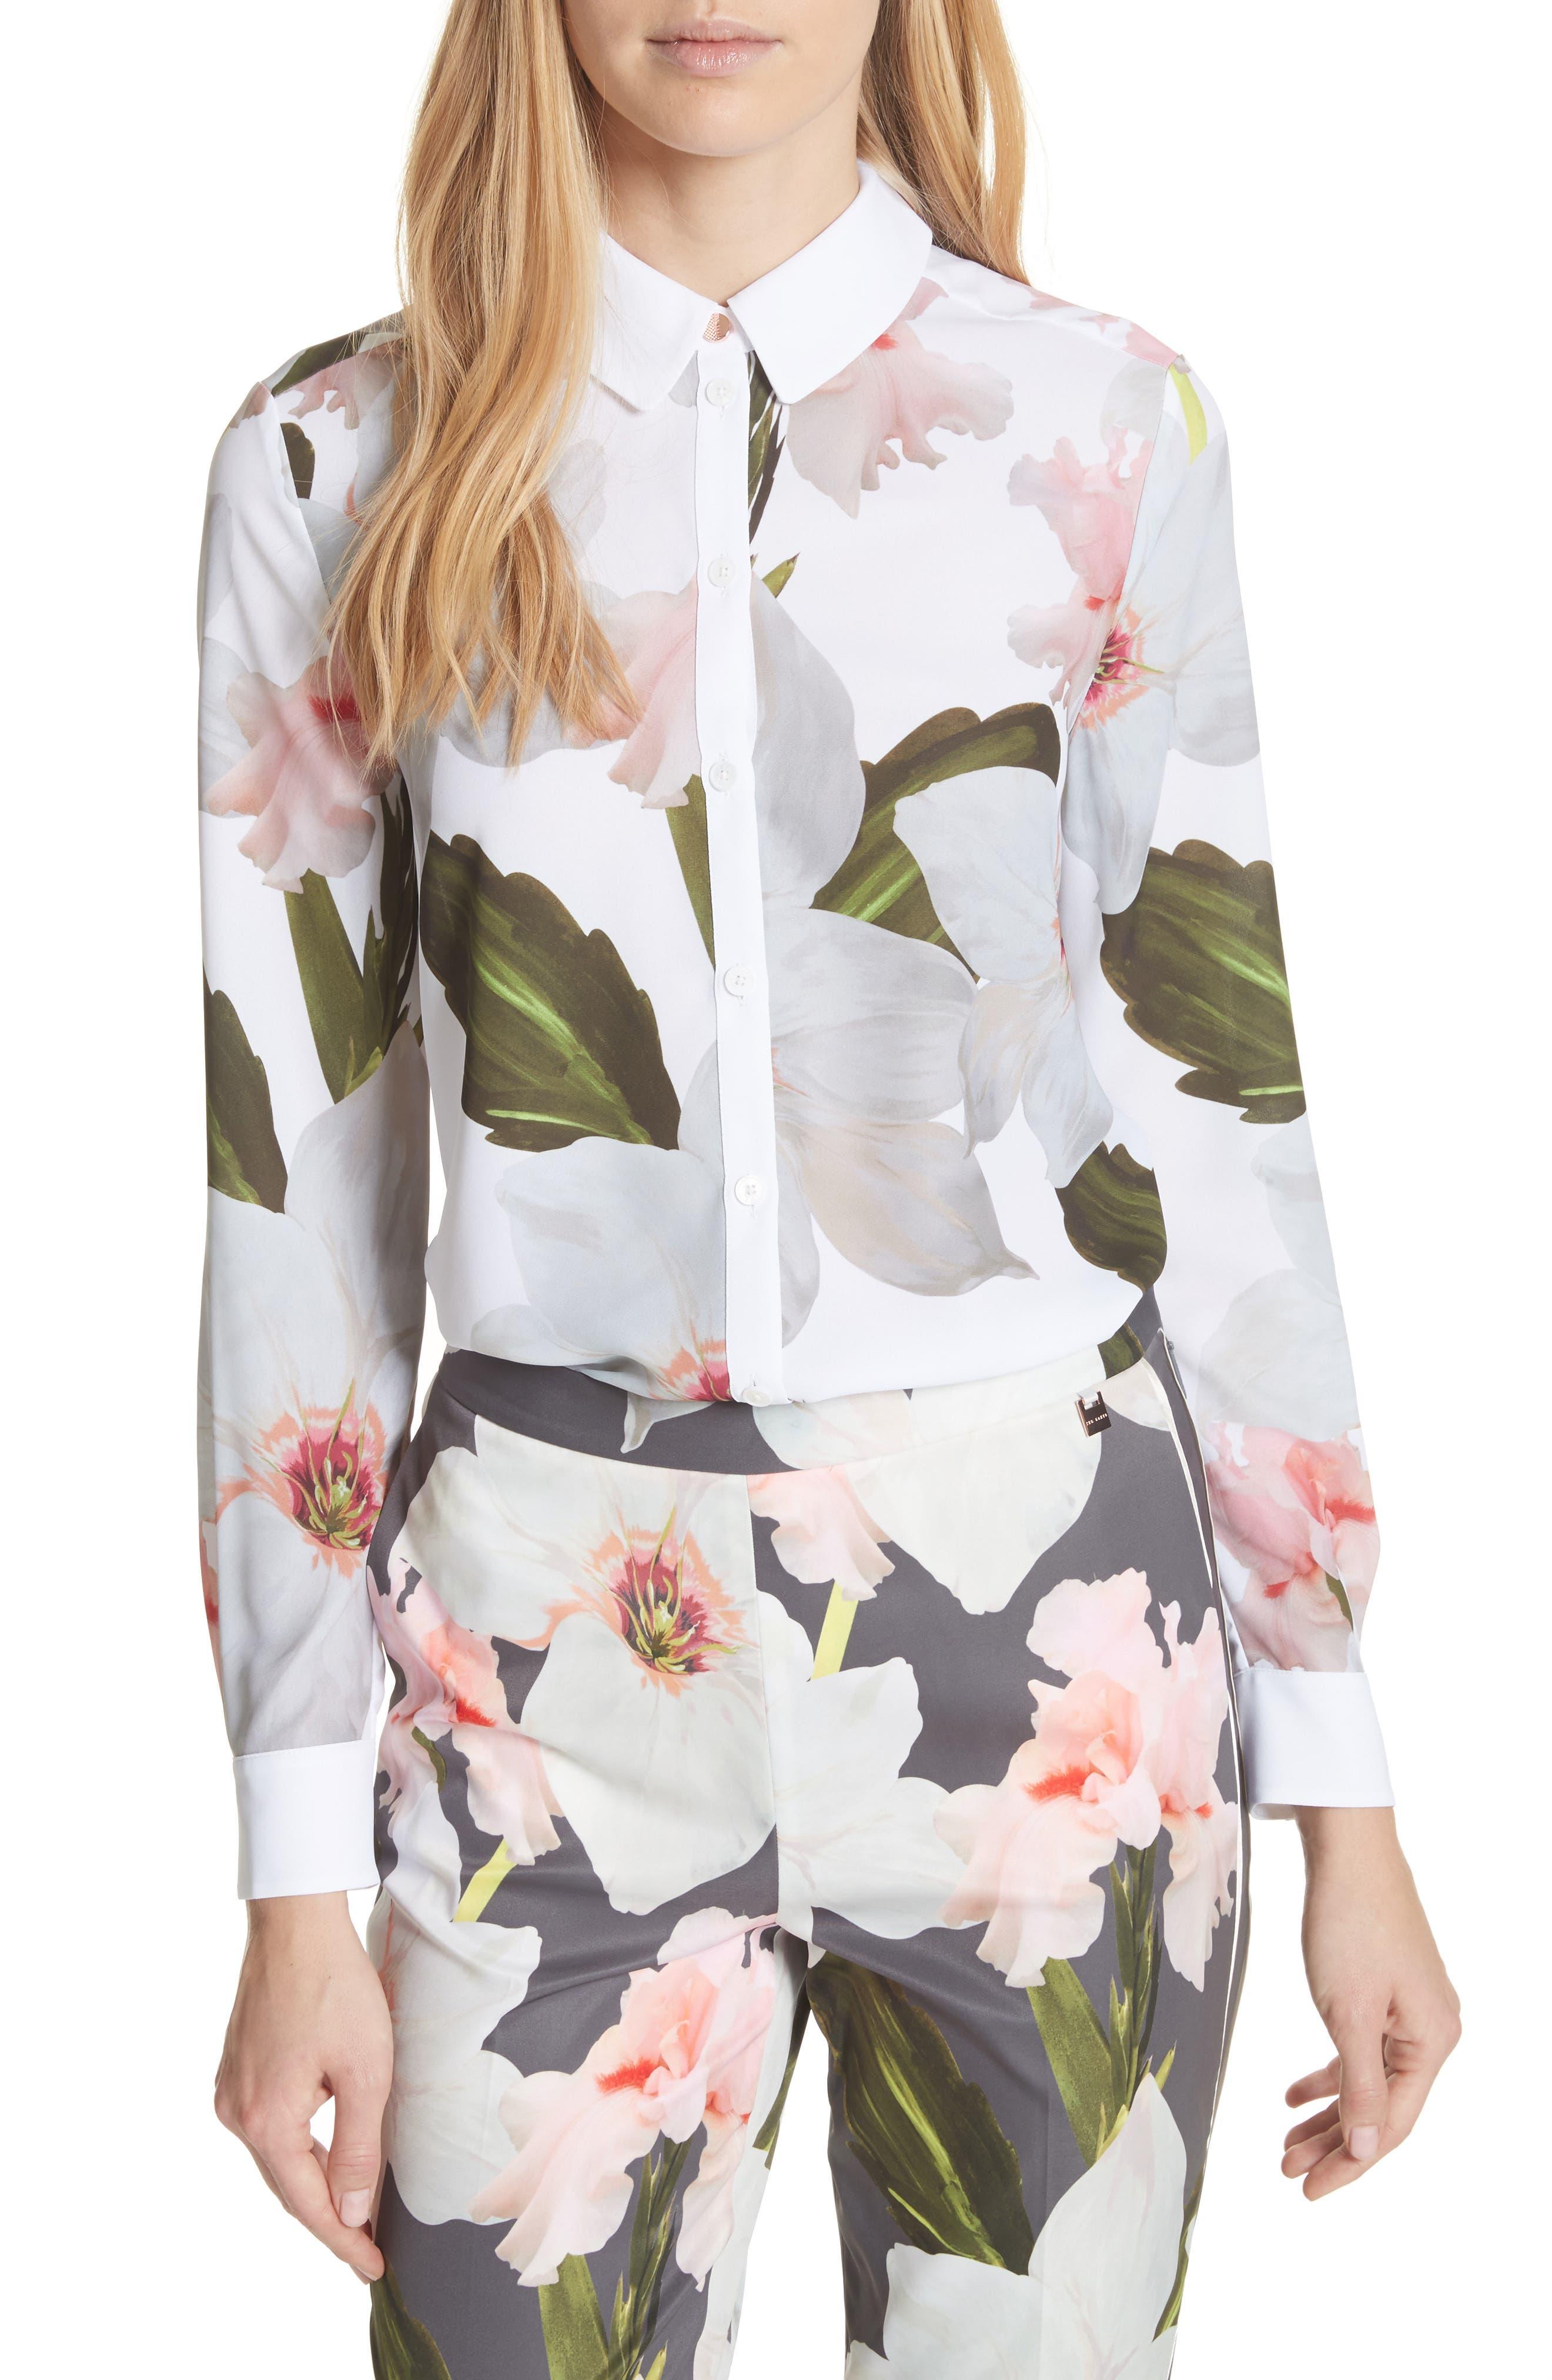 Chatsworth Bloom Shirt,                             Main thumbnail 1, color,                             White